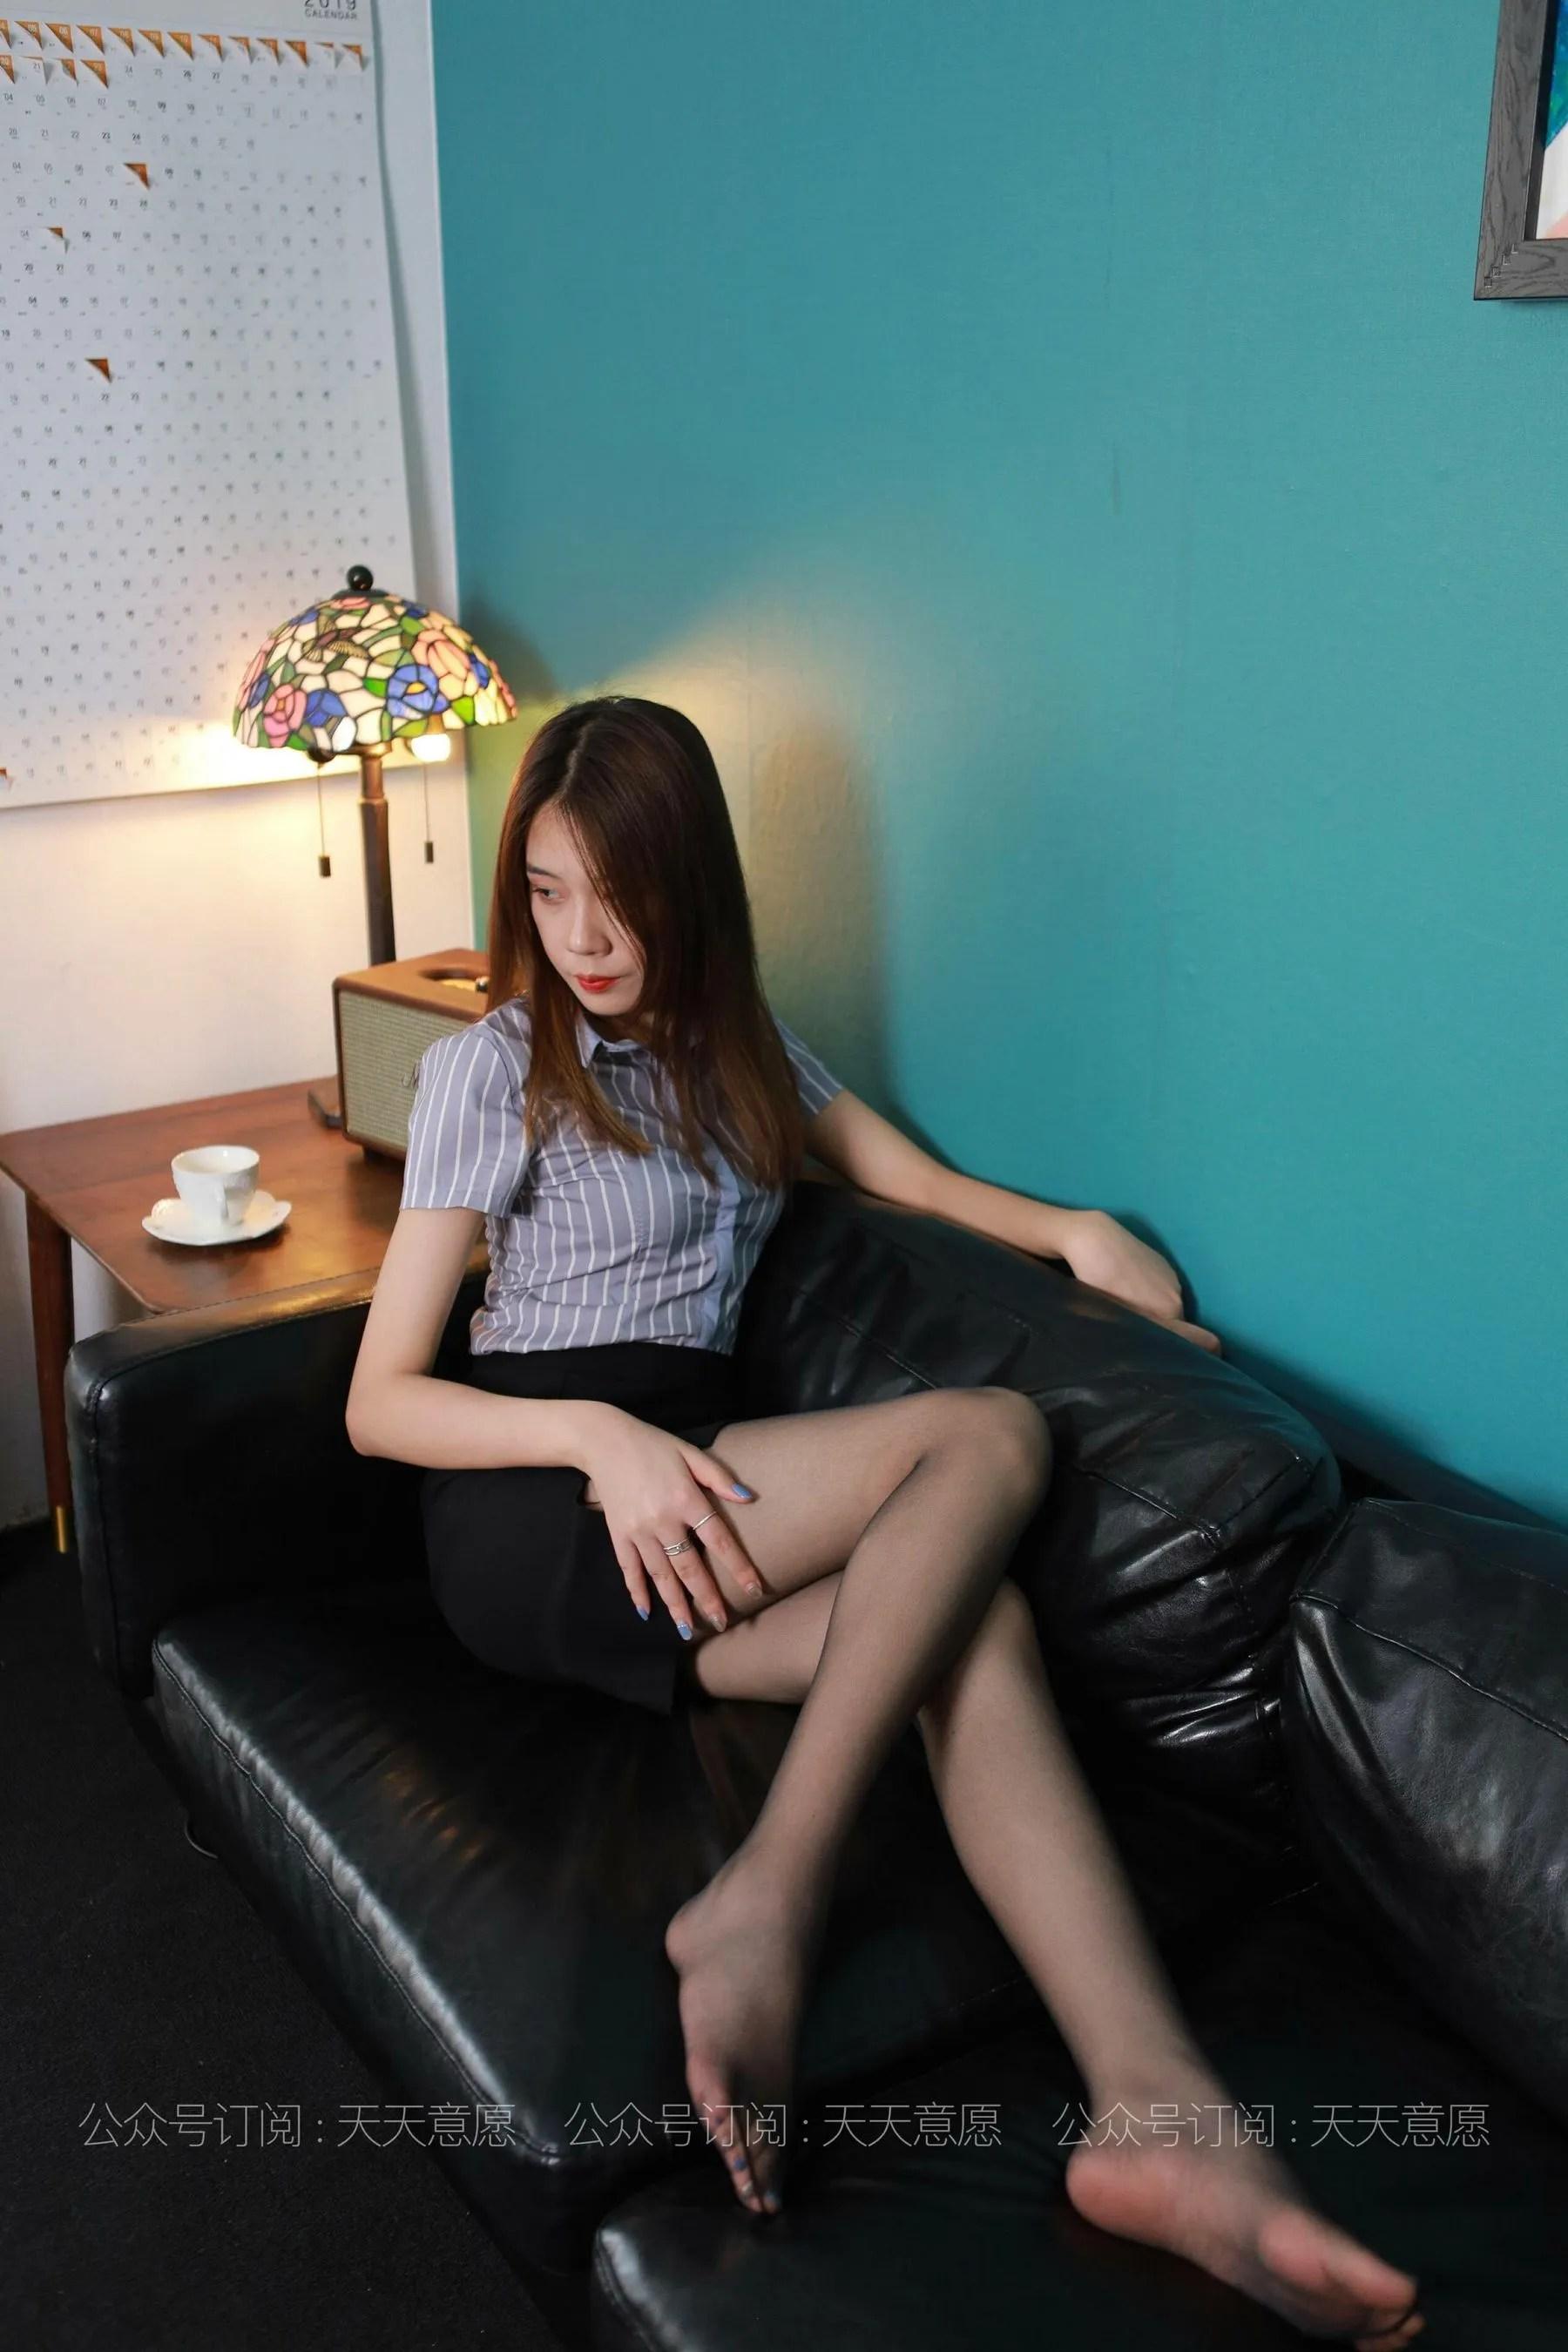 [IESS] 丝享家816: 西瓜《美腿细长直》[92P]插图(2)